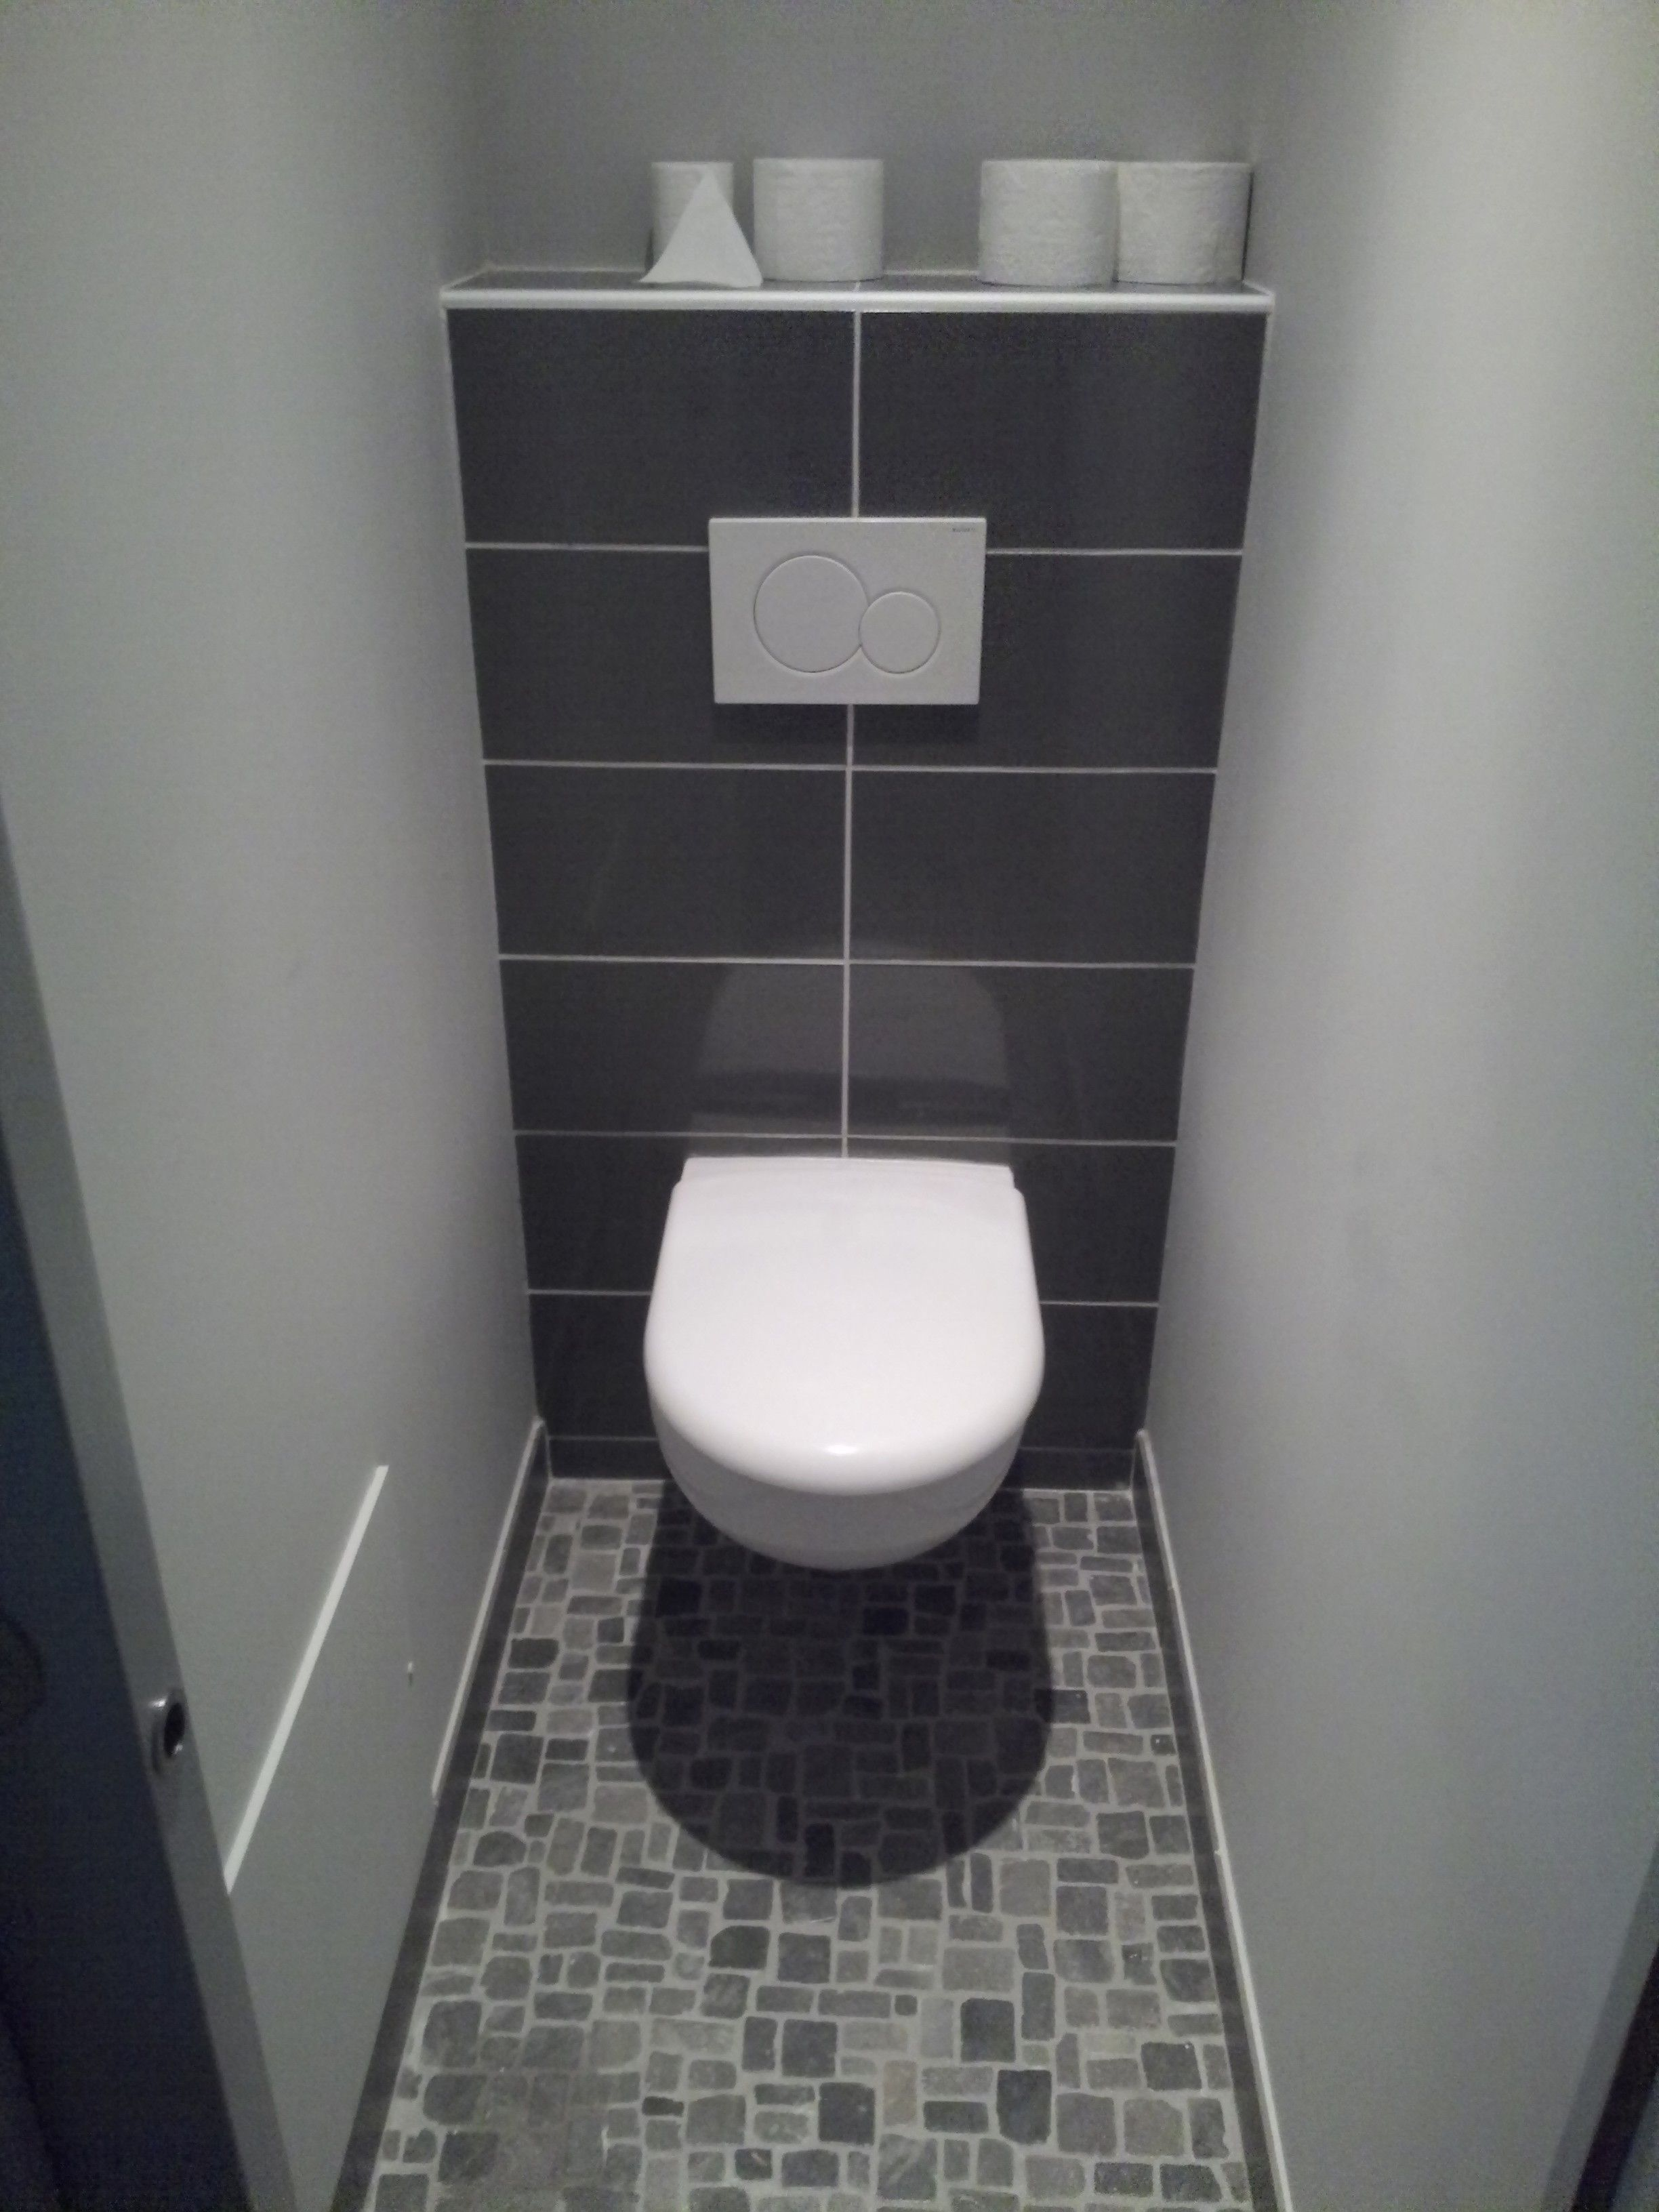 idee deco carrelage salle de bain gris - Buscar con Google ...